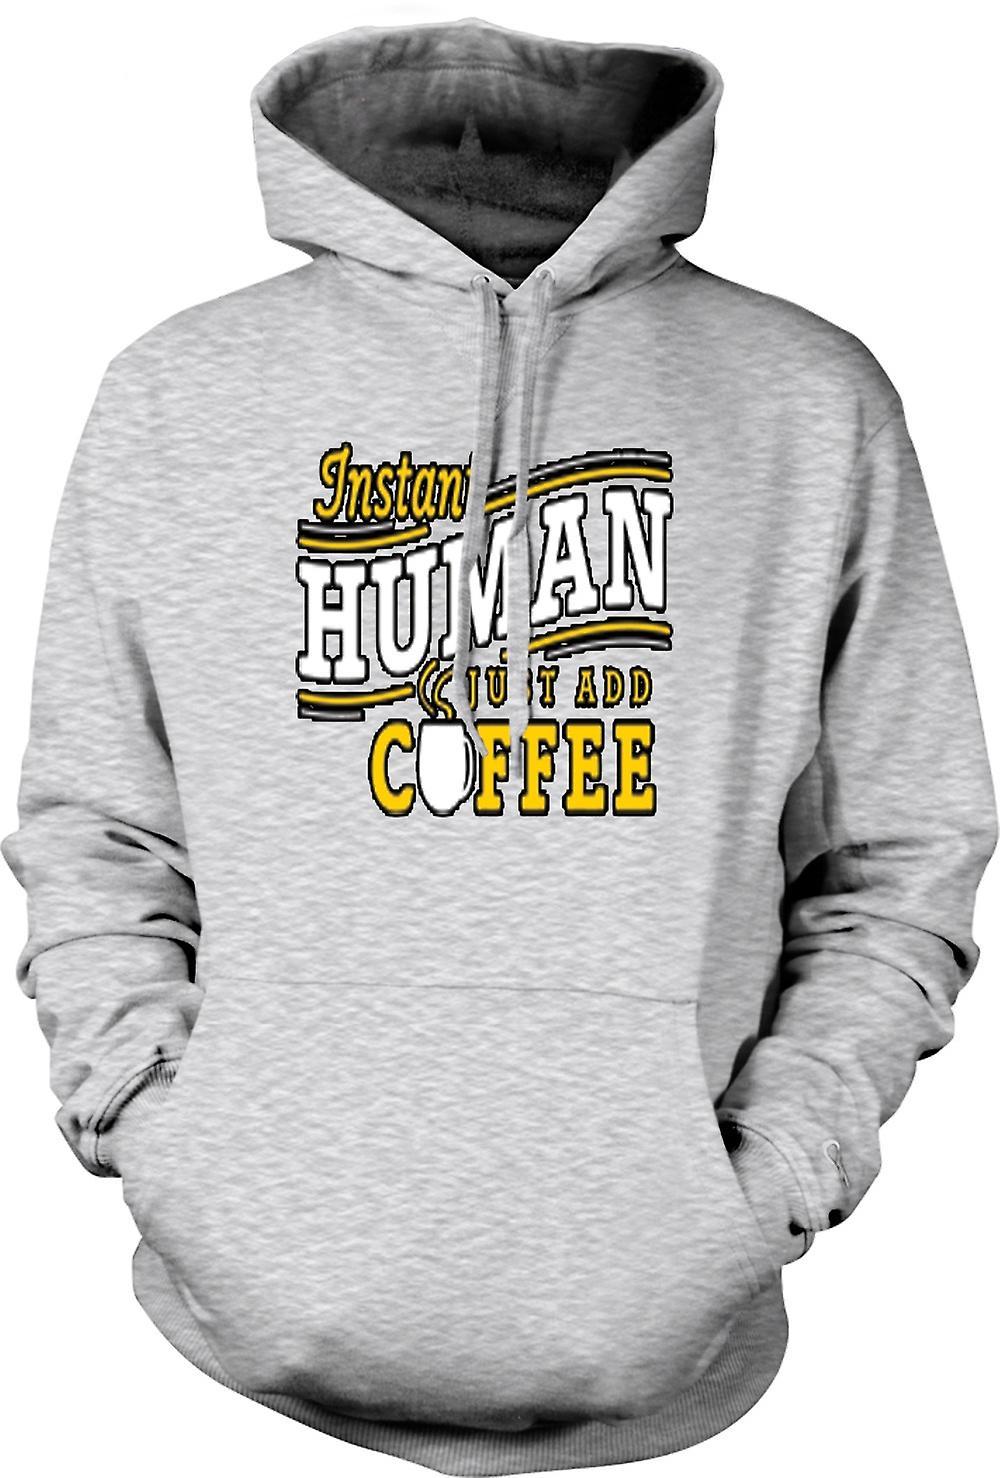 Mens Hoodie - Instant human, just add Coffee